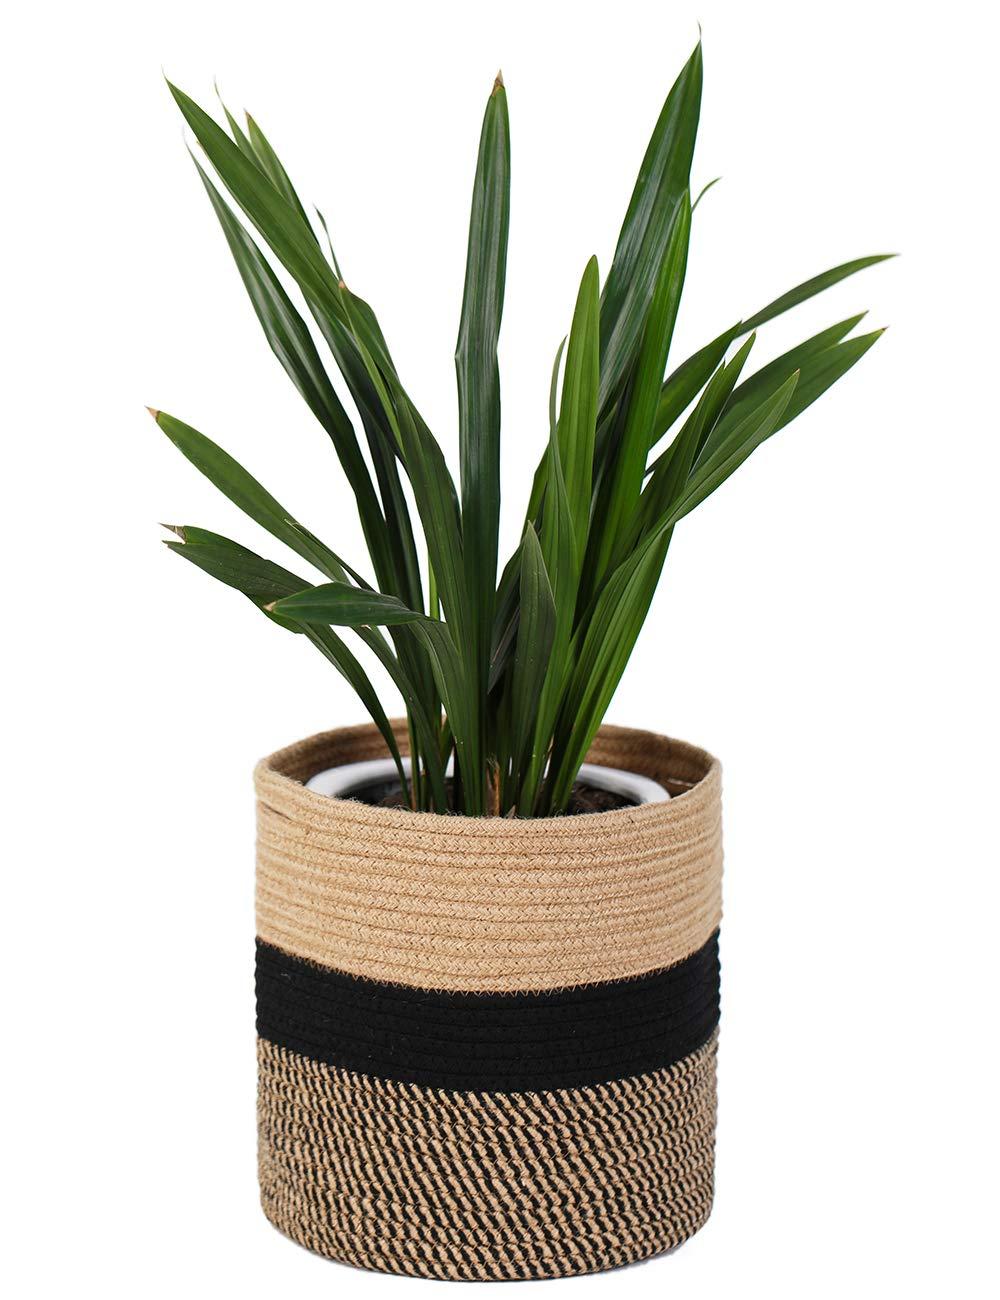 YXMYH Sturdy Jute Rope Plant Basket Modern Woven Basket for10 Flower Pot Floor Indoor Planters, 11 x 11 Storage Organizer Basket Rustic Home Decor,Toy Storage Basket For Kids Room, Black and Beige